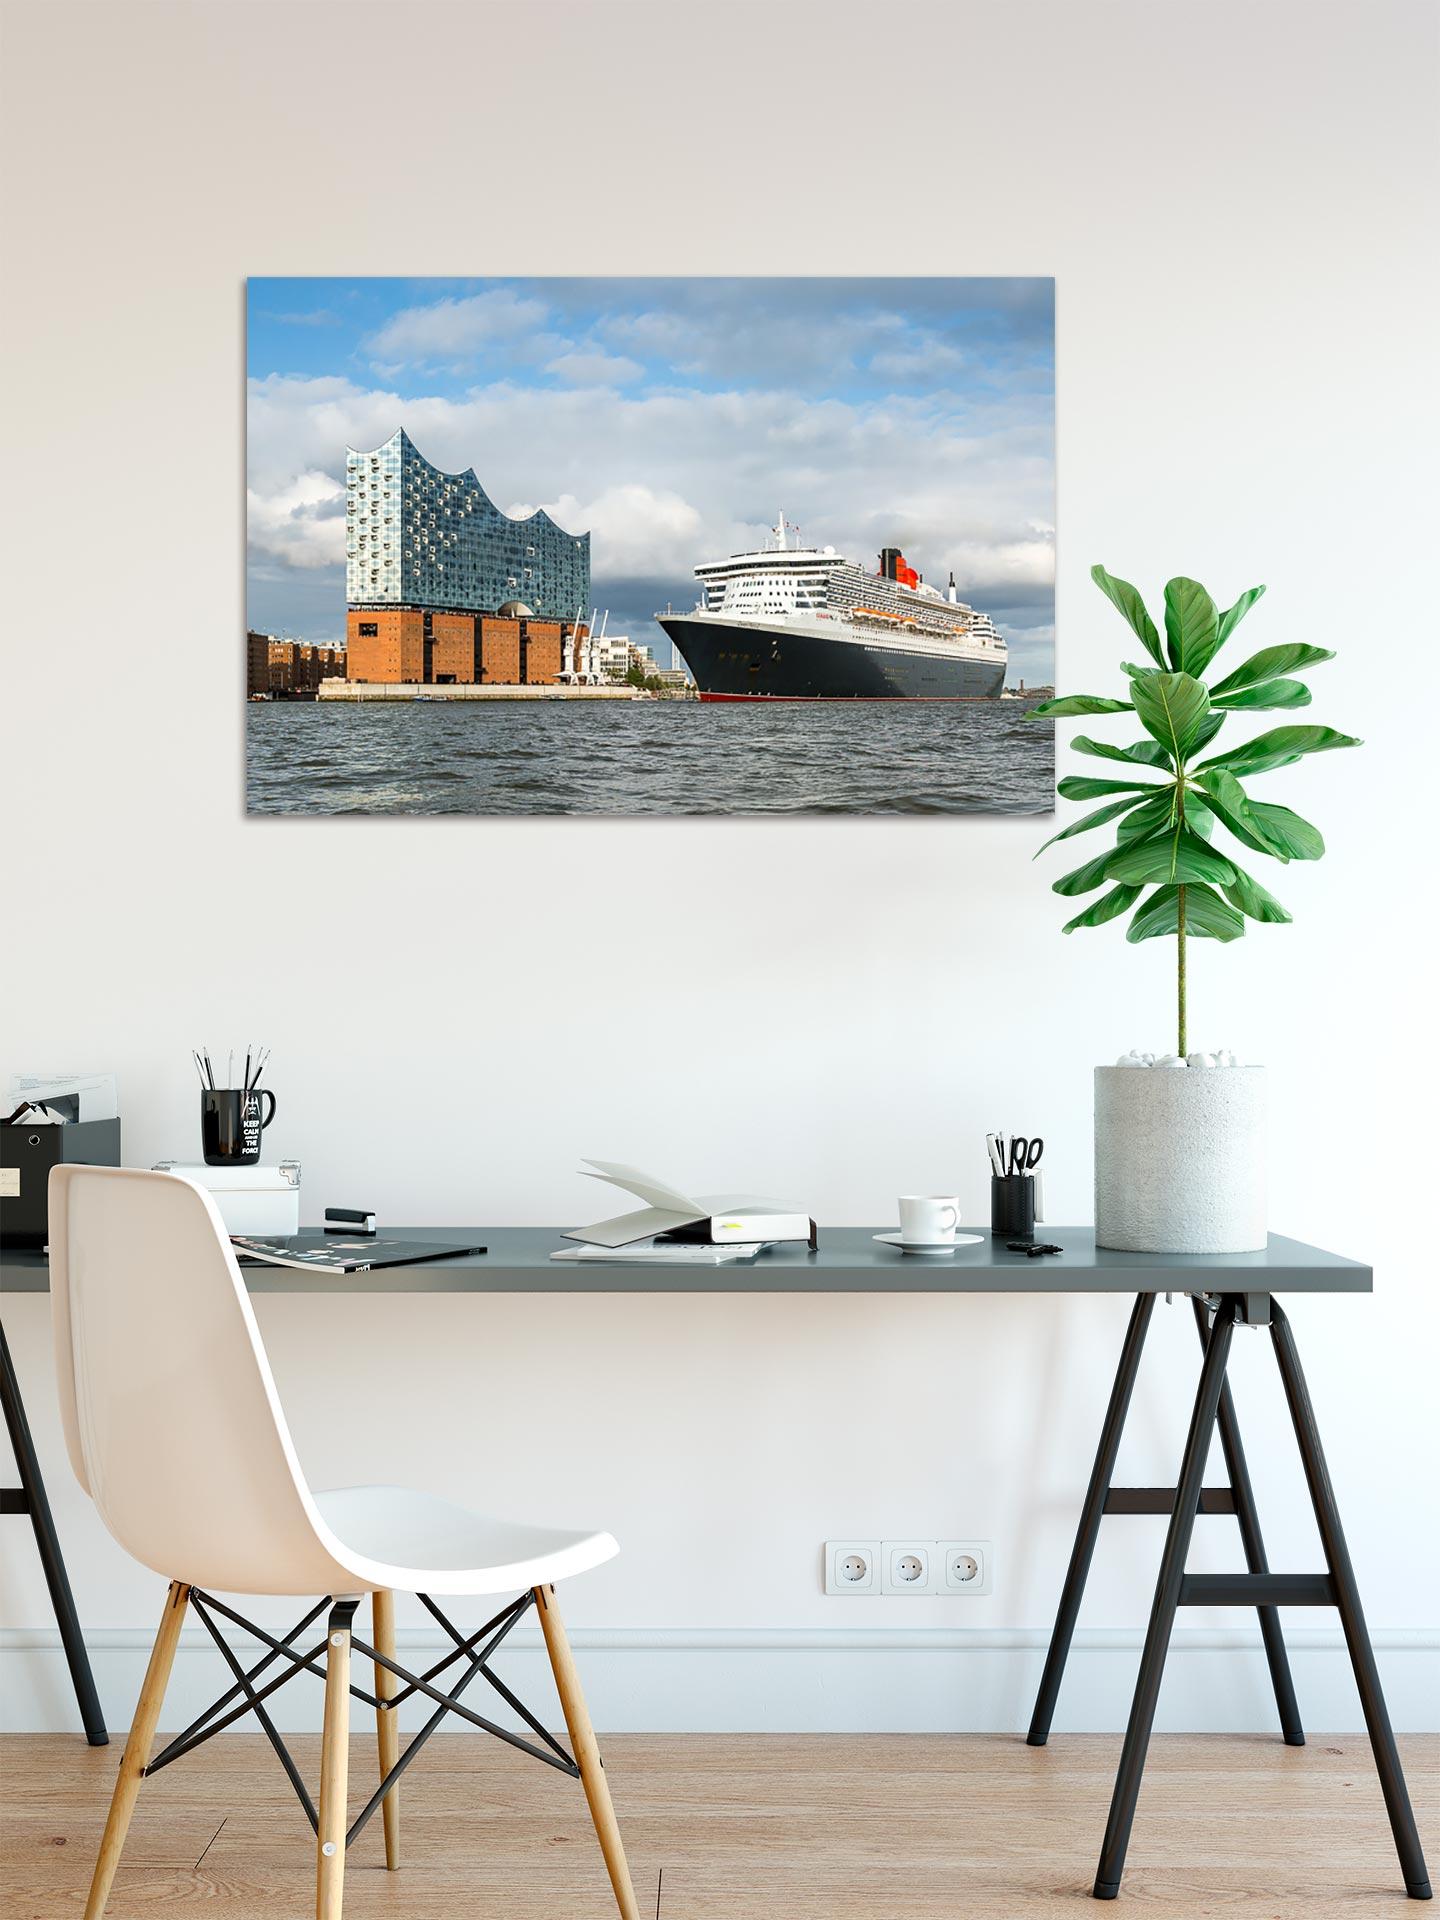 JS094-queen-mary-elbphilharmonie-wandbild-bild-auf-leinwand-acrylglas-aludibond-arbeitszimmer